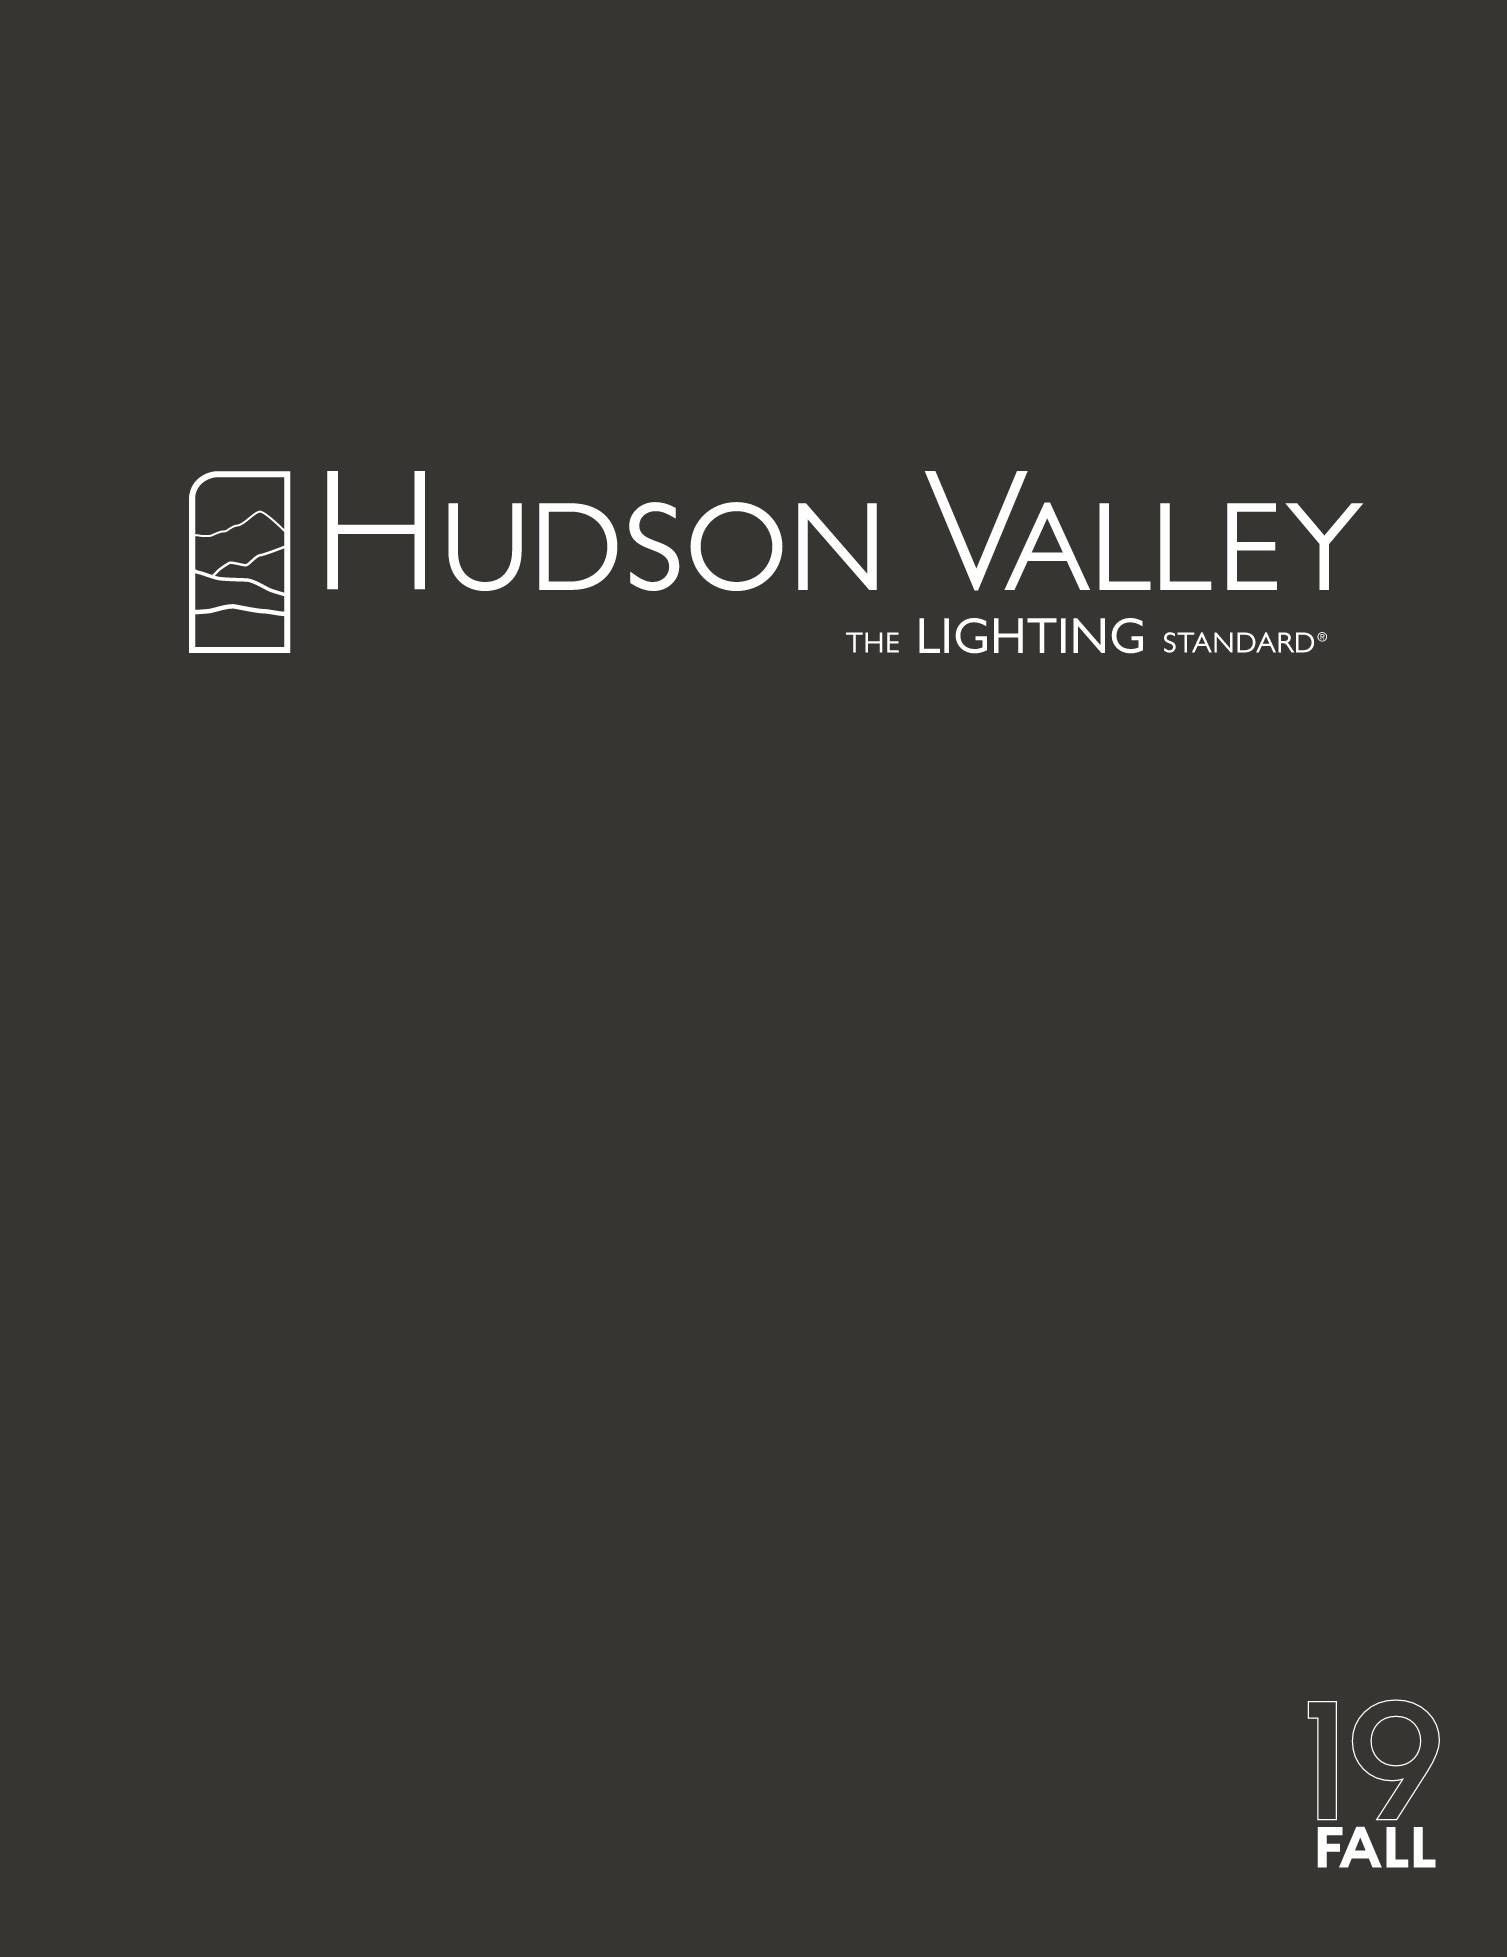 Hudson Valley NEW